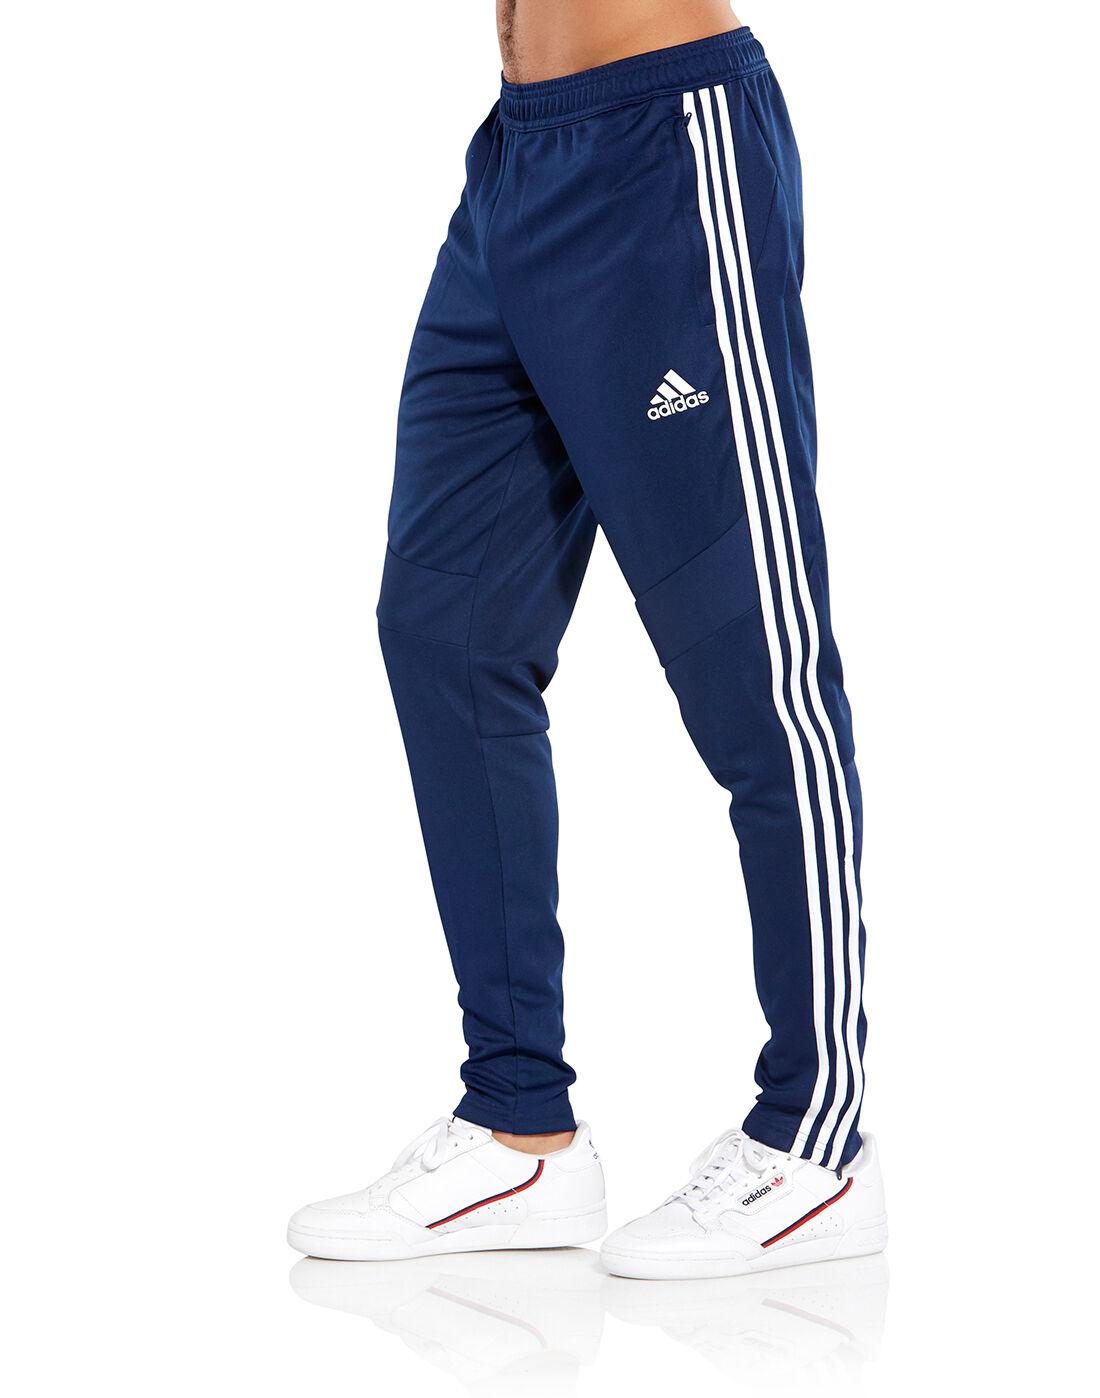 Men's Navy adidas Track Pants   Life